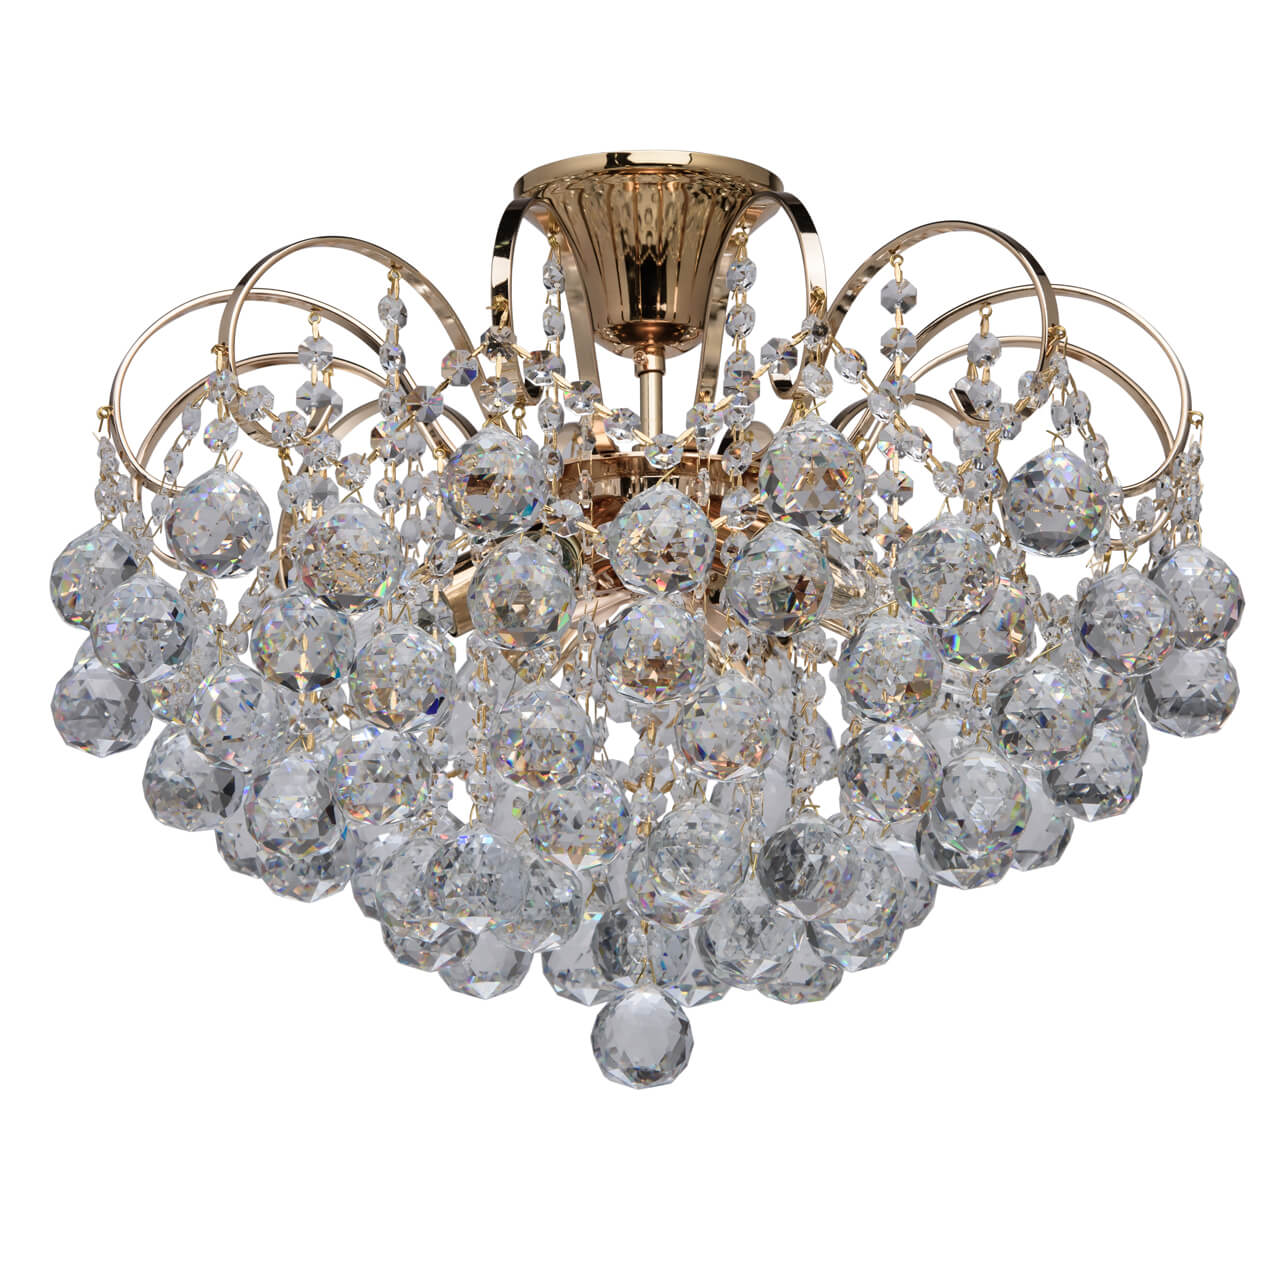 цены Потолочная люстра MW-Light Жемчуг 9 232016406